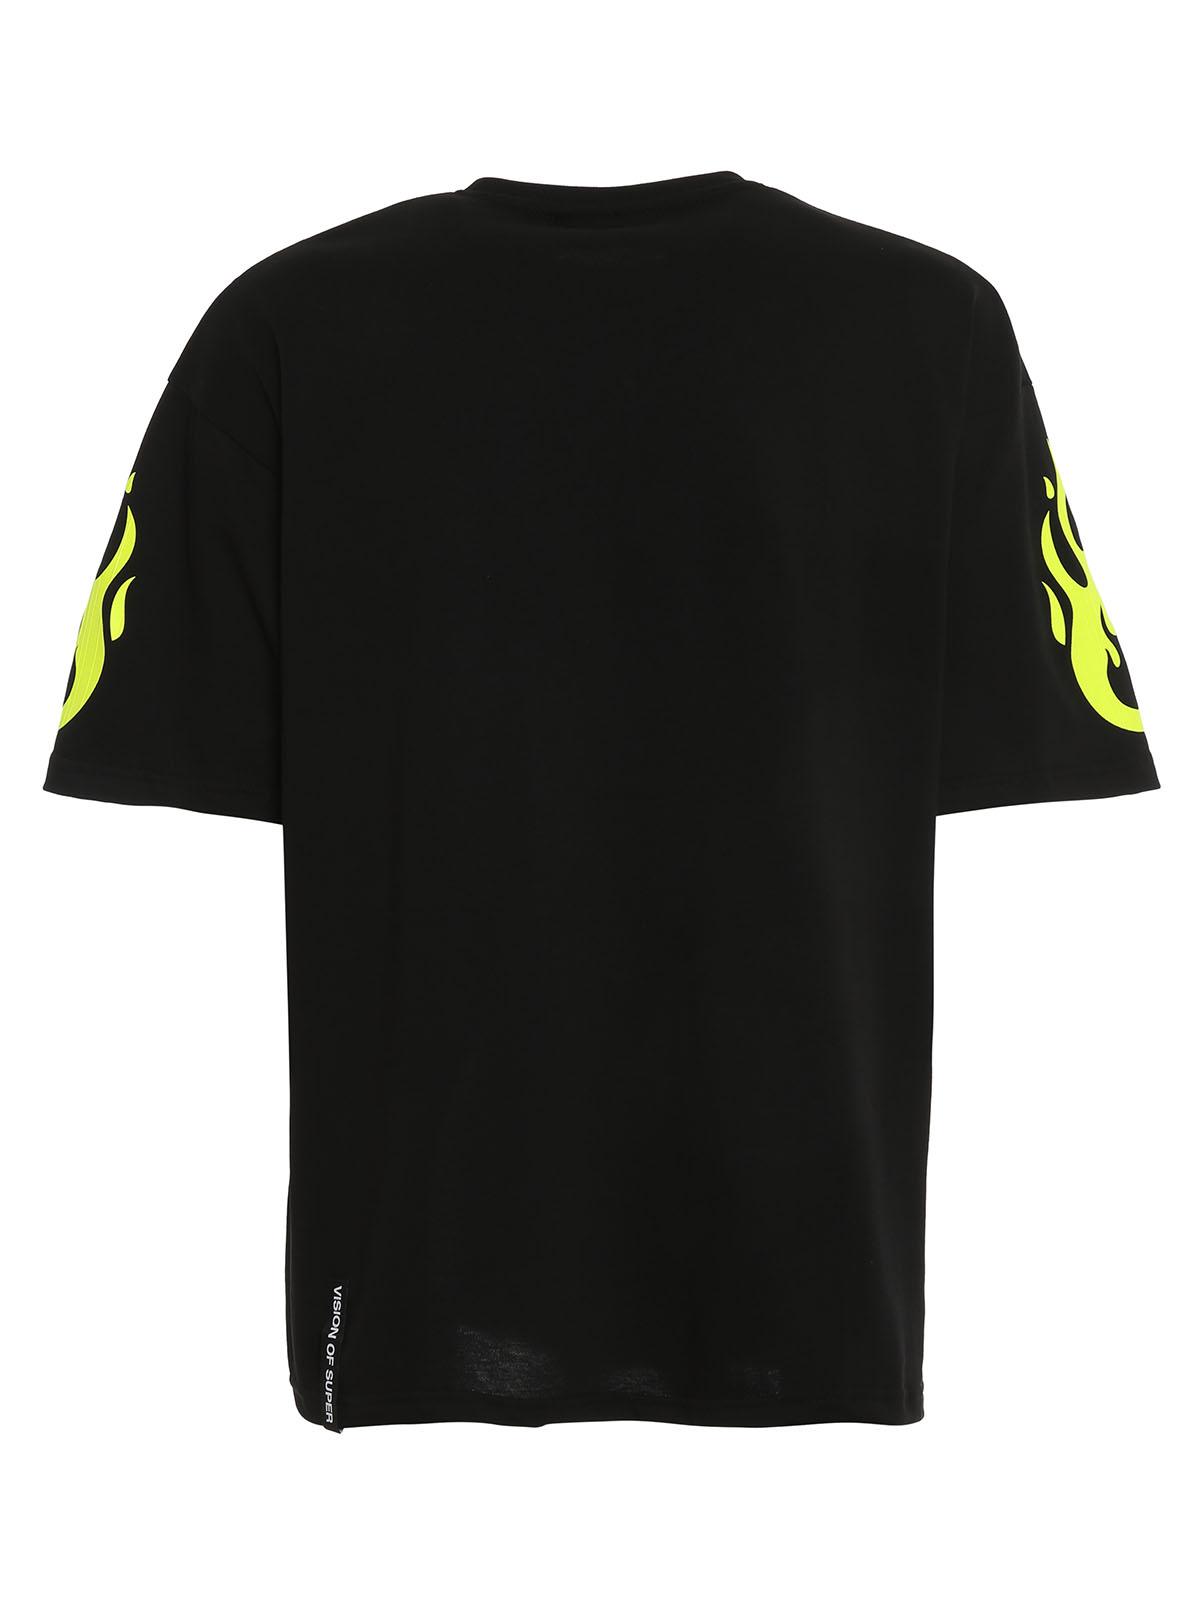 Immagine di Vision Of Super | Tshirt Fire Yellow Fluo